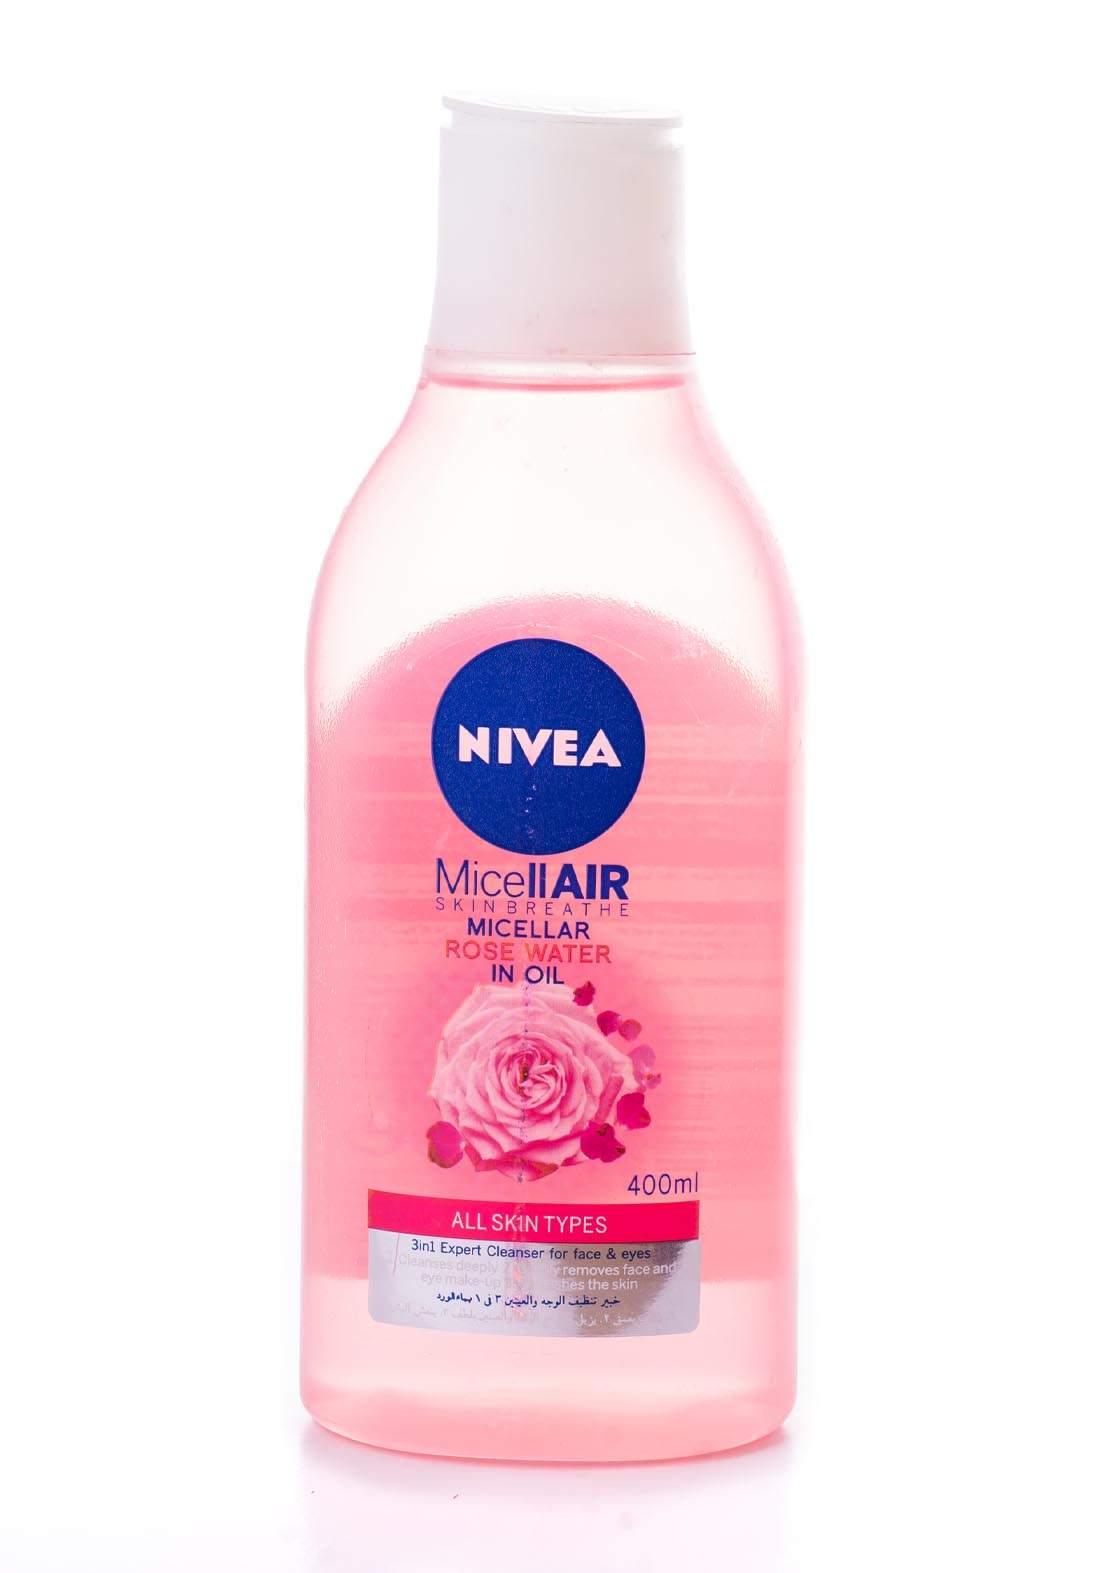 Nivea Micellair Skin Brethe Rose Water In Oile 400ml مزيل المكياج